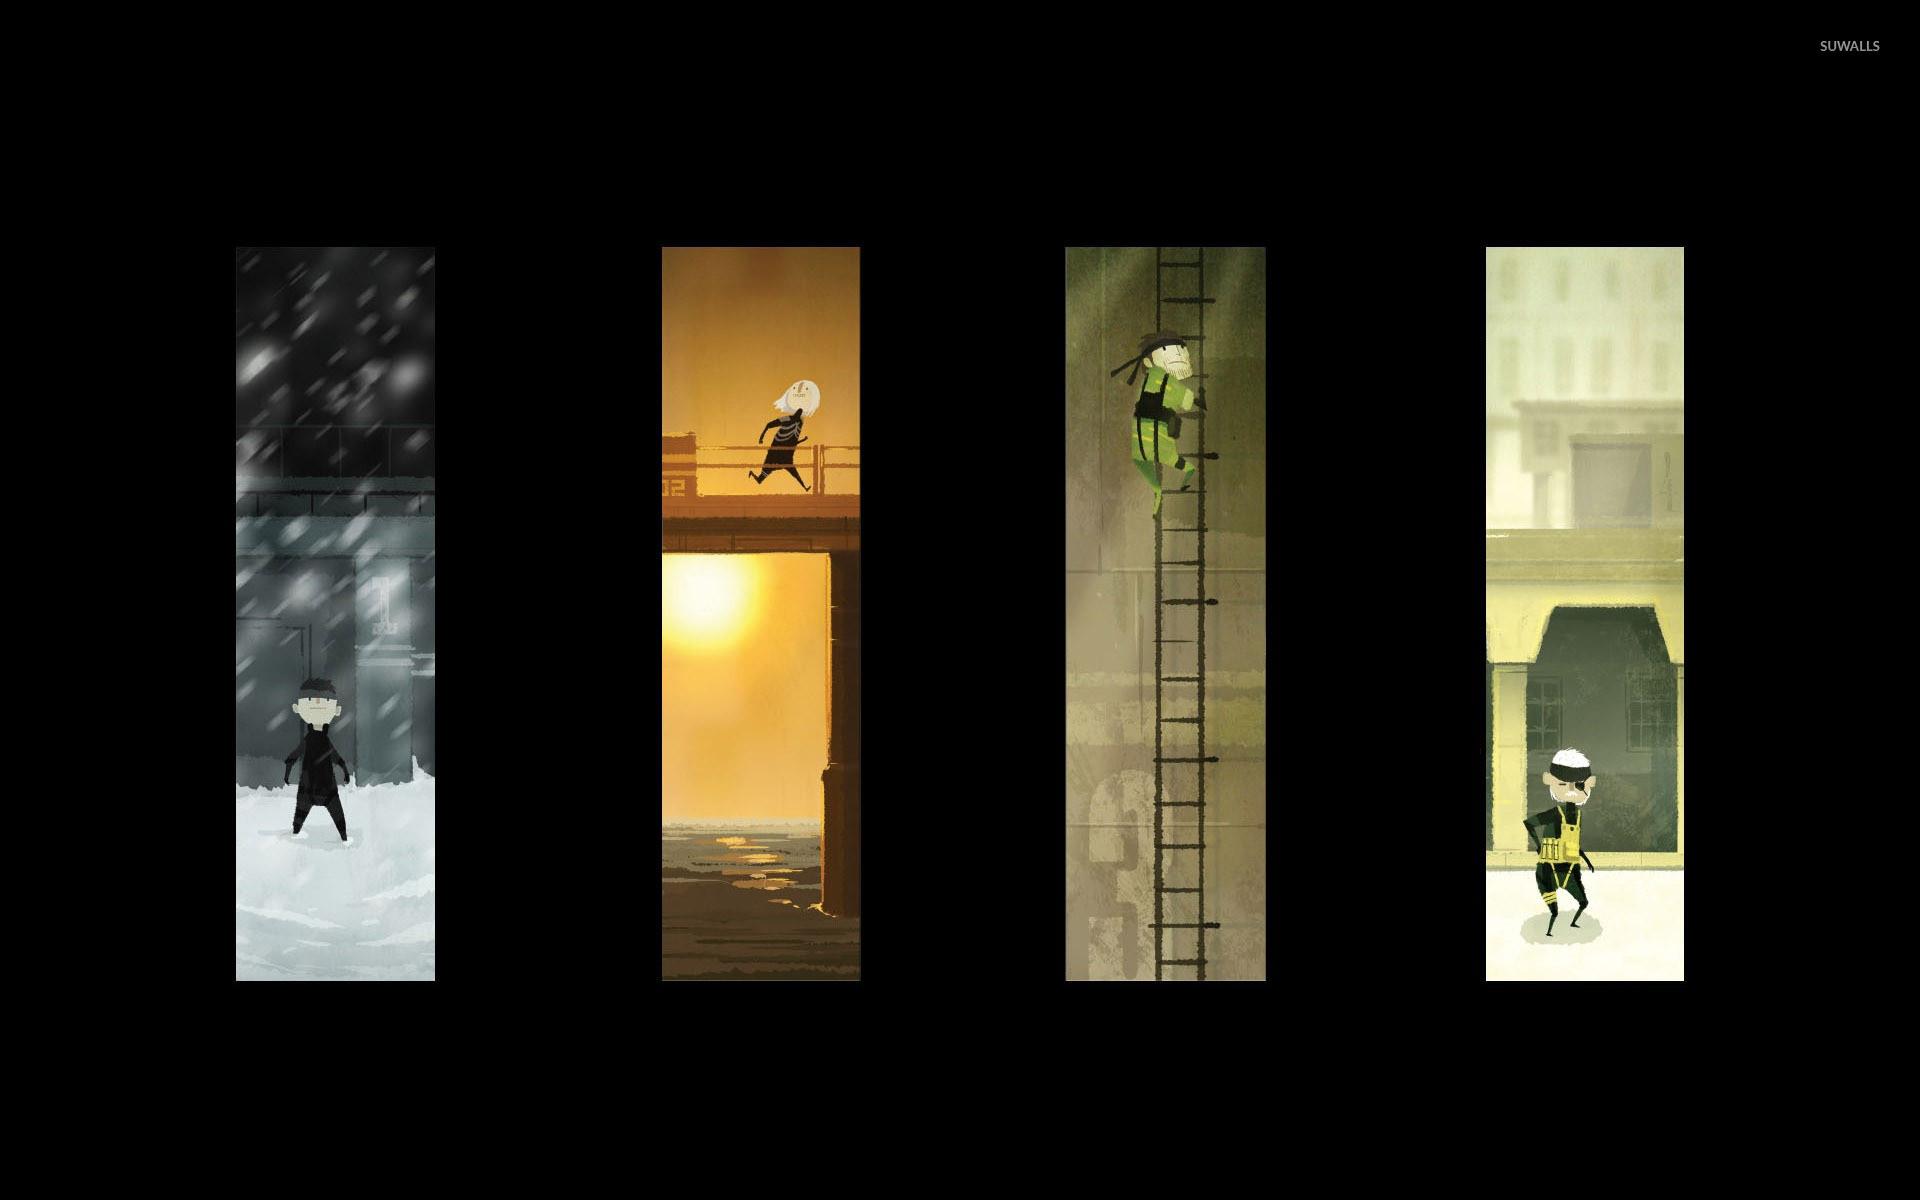 Metal Gear Solid artwork wallpaper jpg